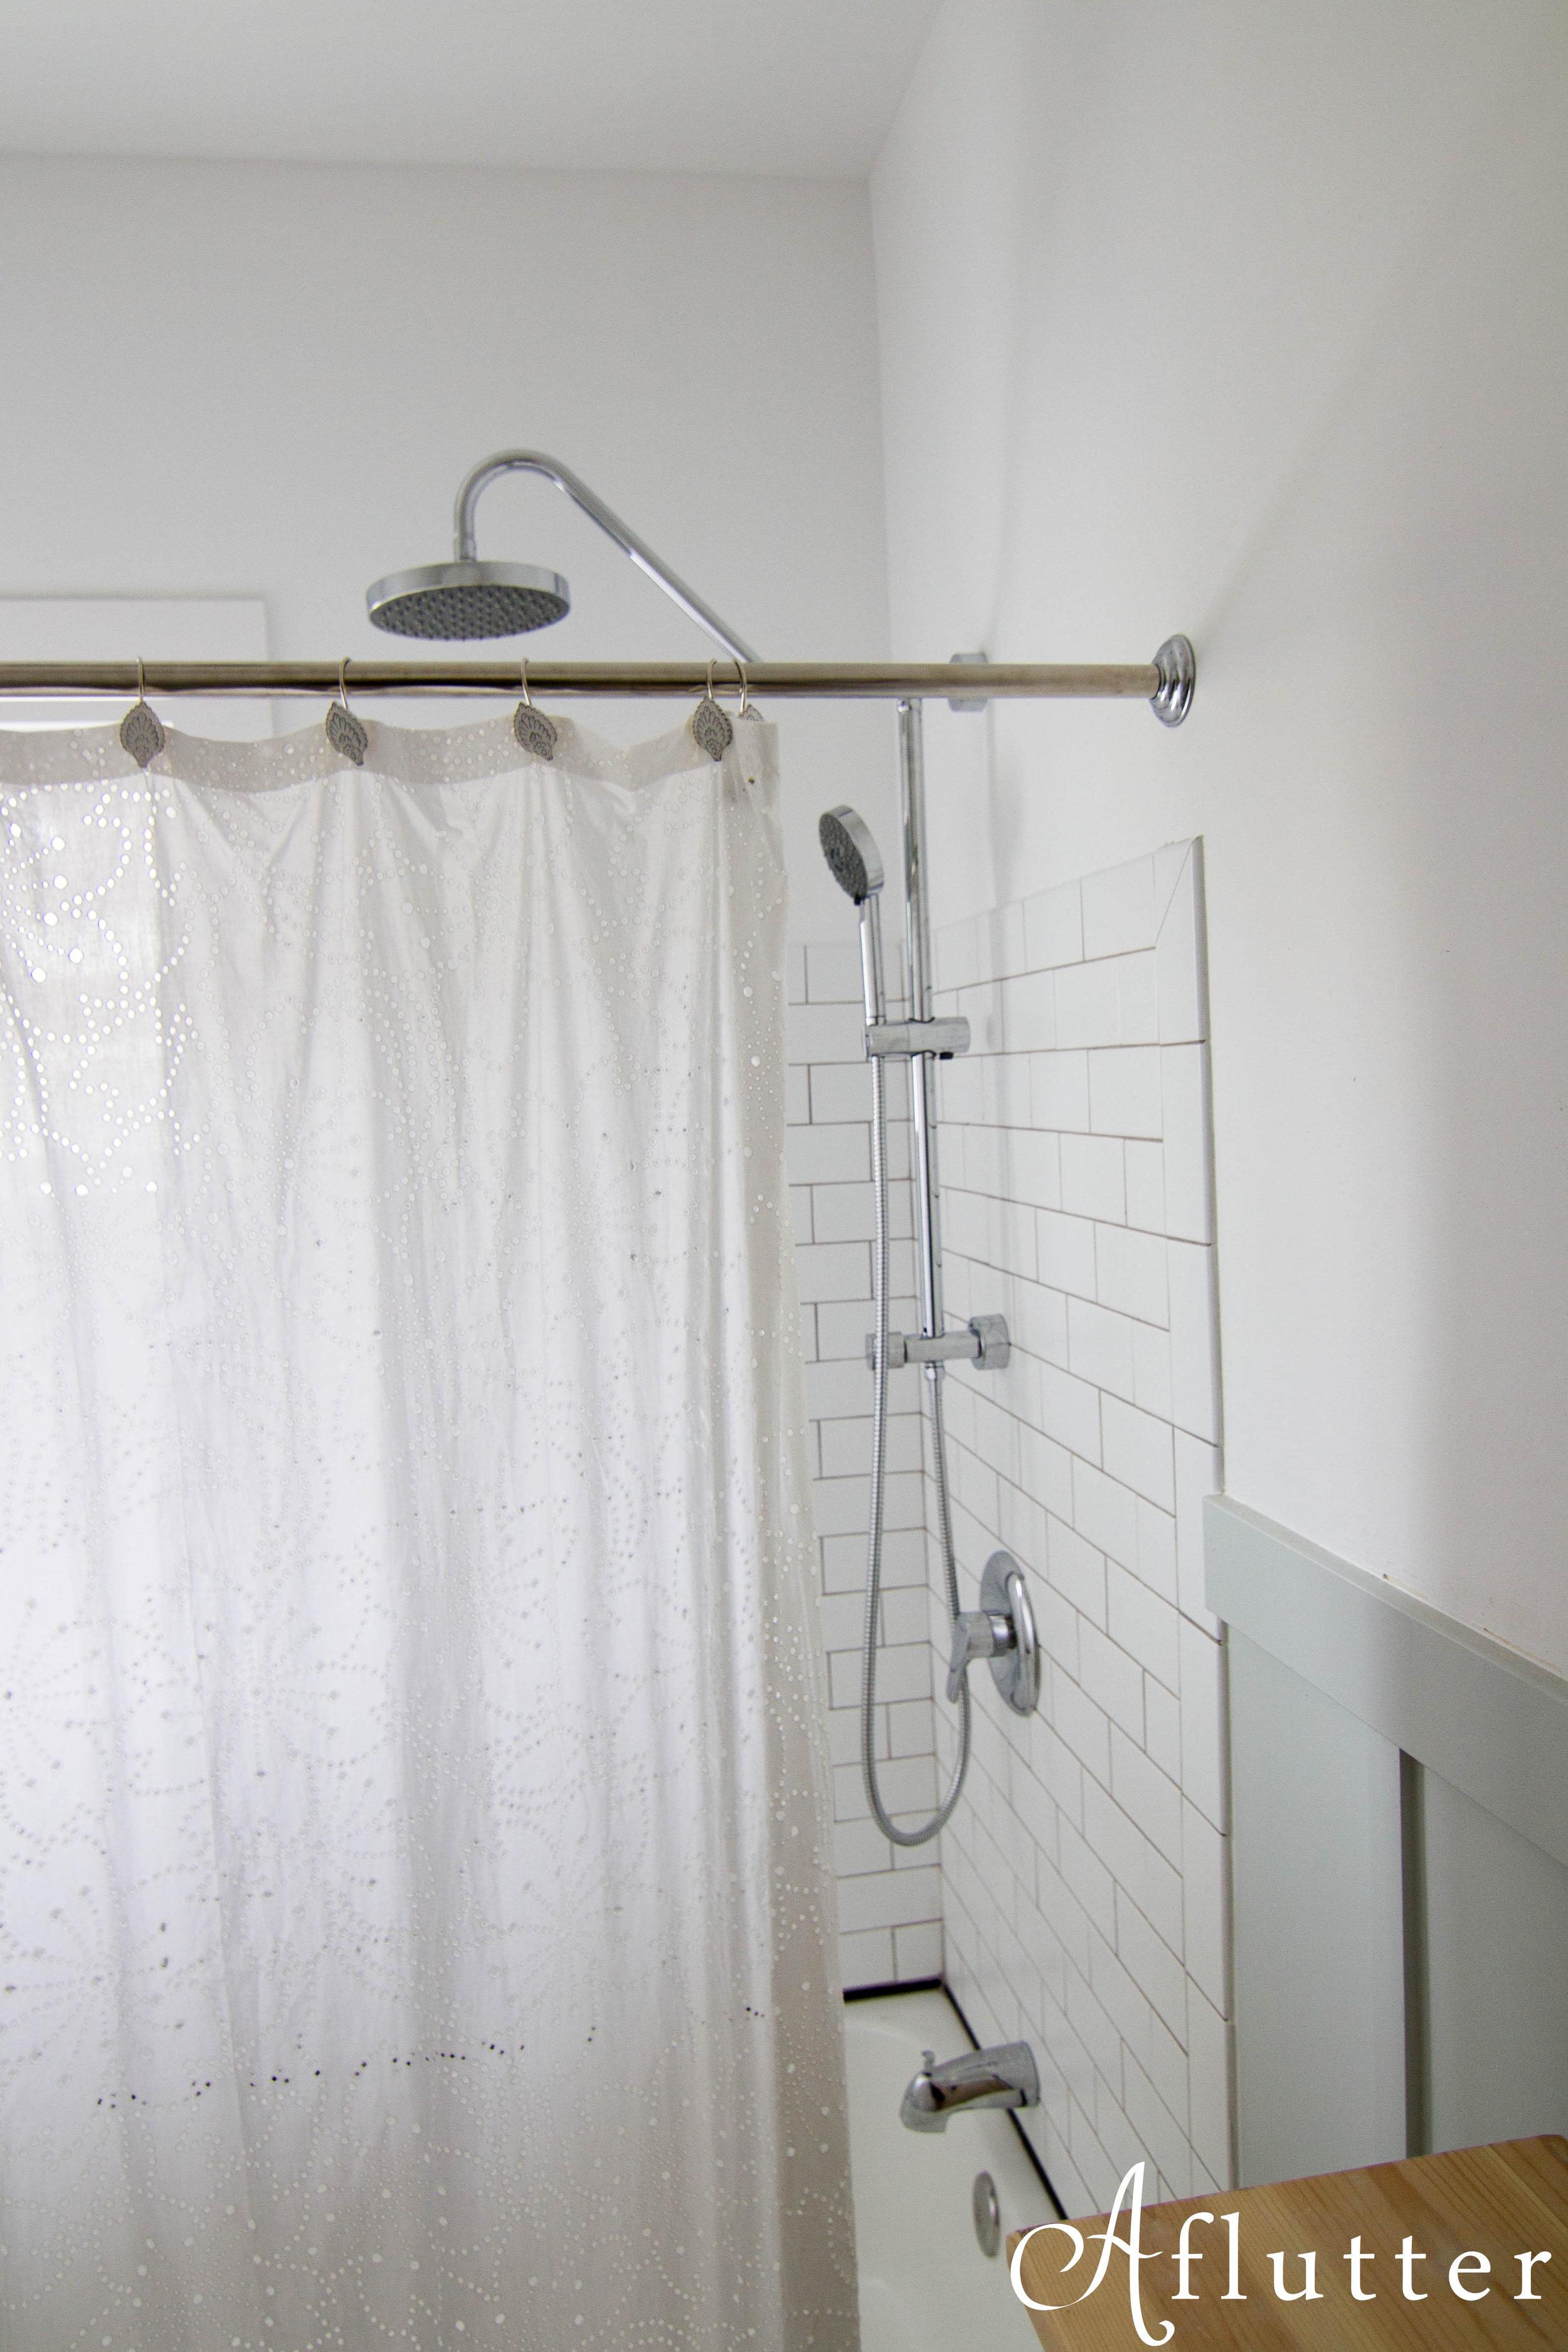 Bath-Remodel-4-of-11.jpg